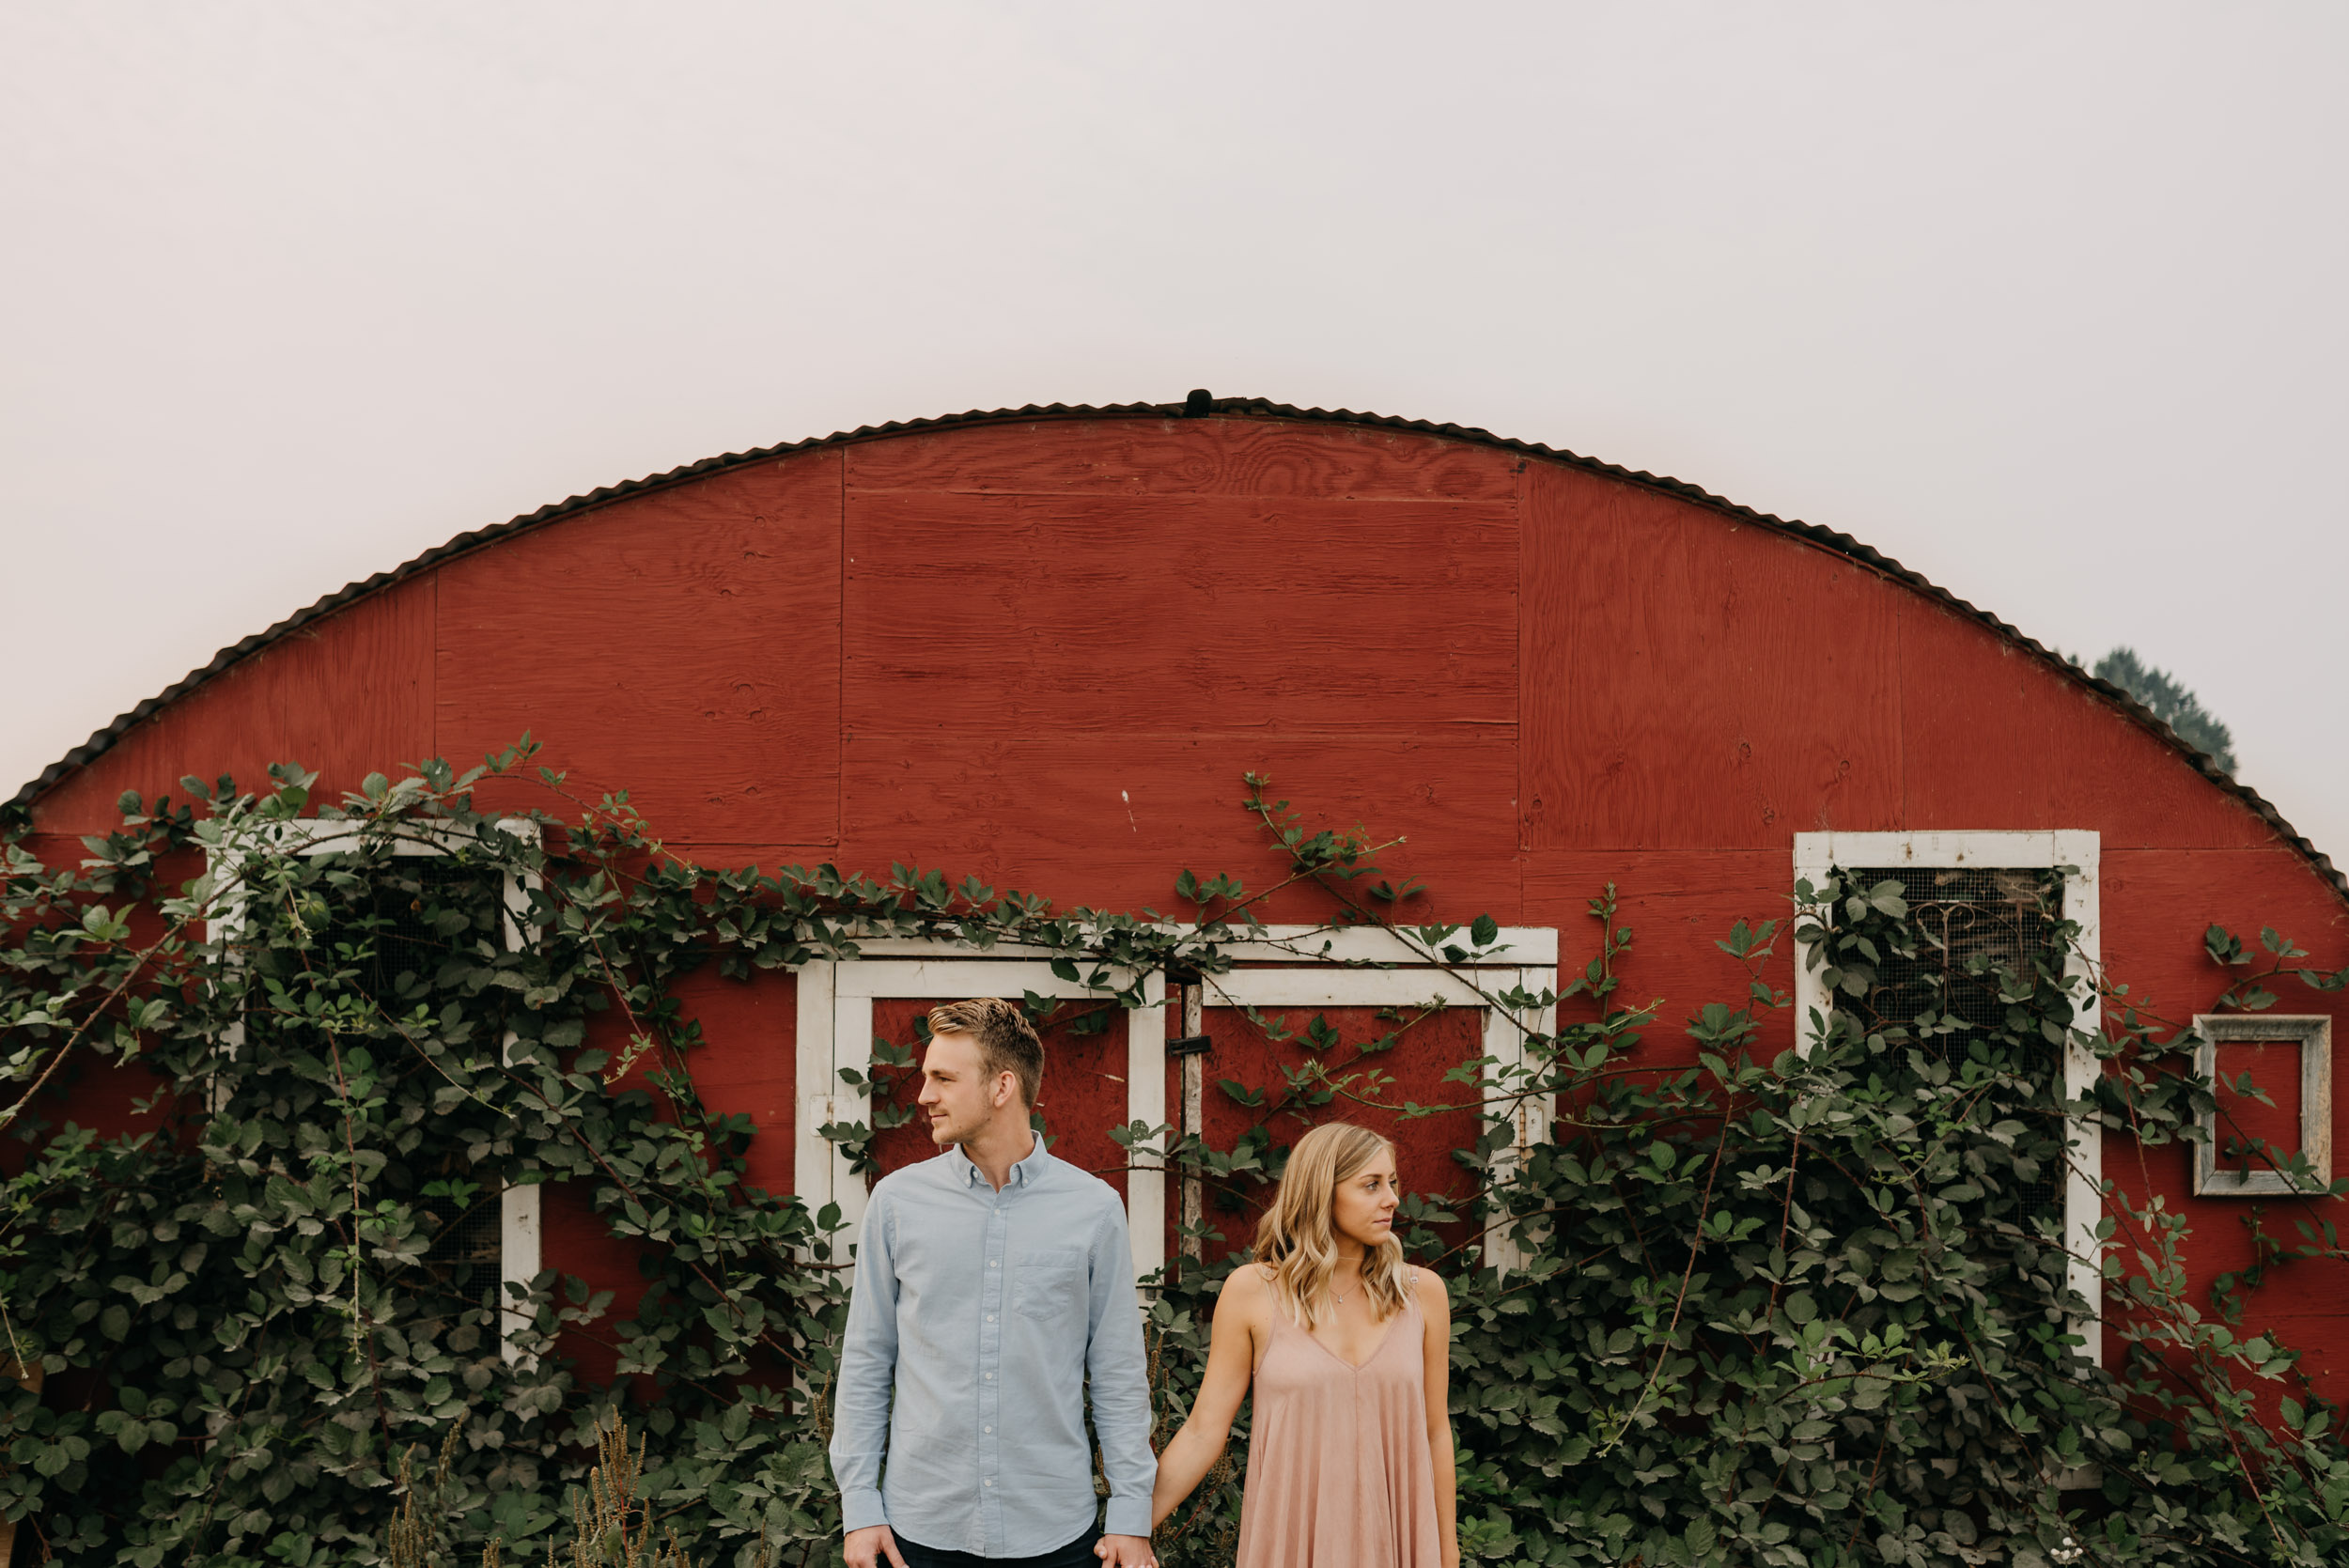 Oregon-Red-Barn-Door-Engagement-Sauvie-3376.jpg